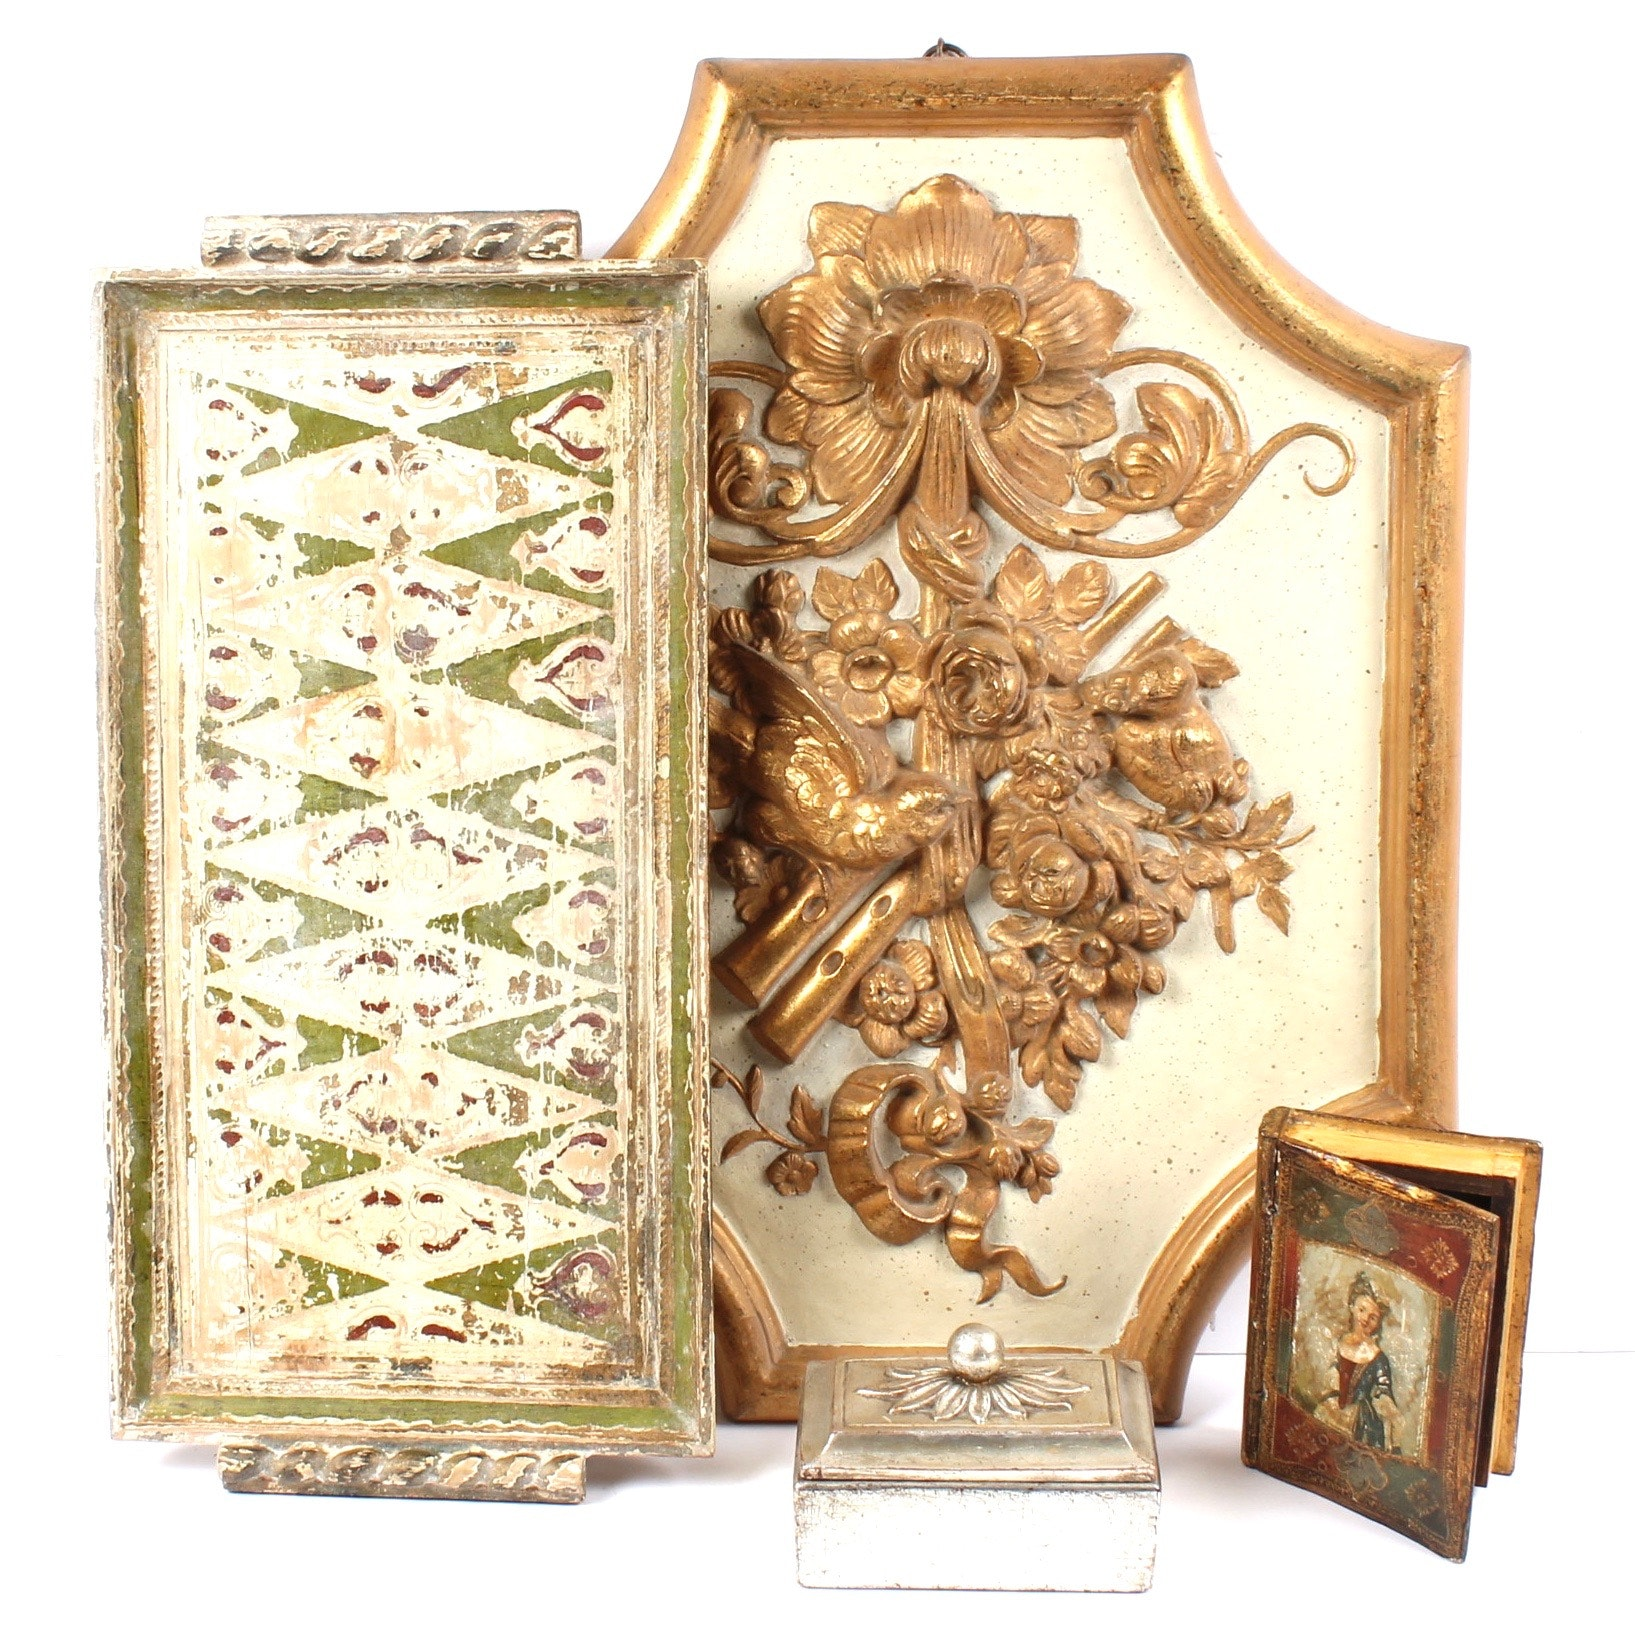 Vintage Florentine Style Gilt Decor Featuring Borghese